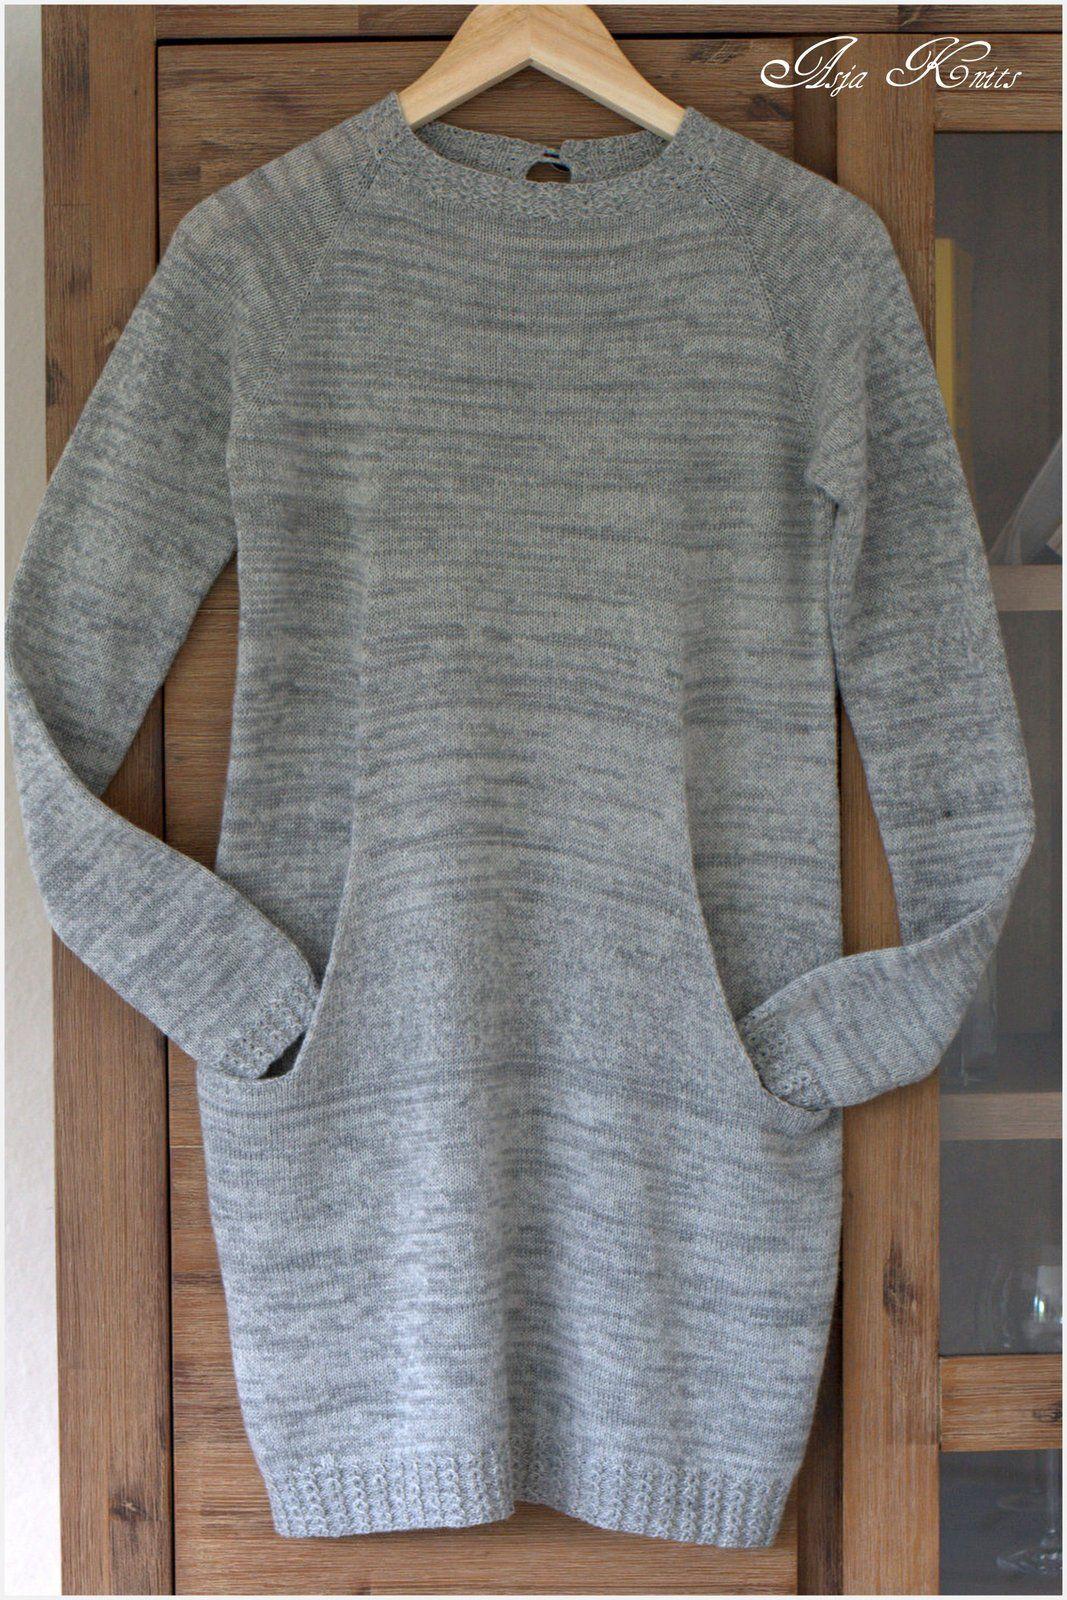 Asja knits: Still Light Tunic - Finished!/ Zakończona!